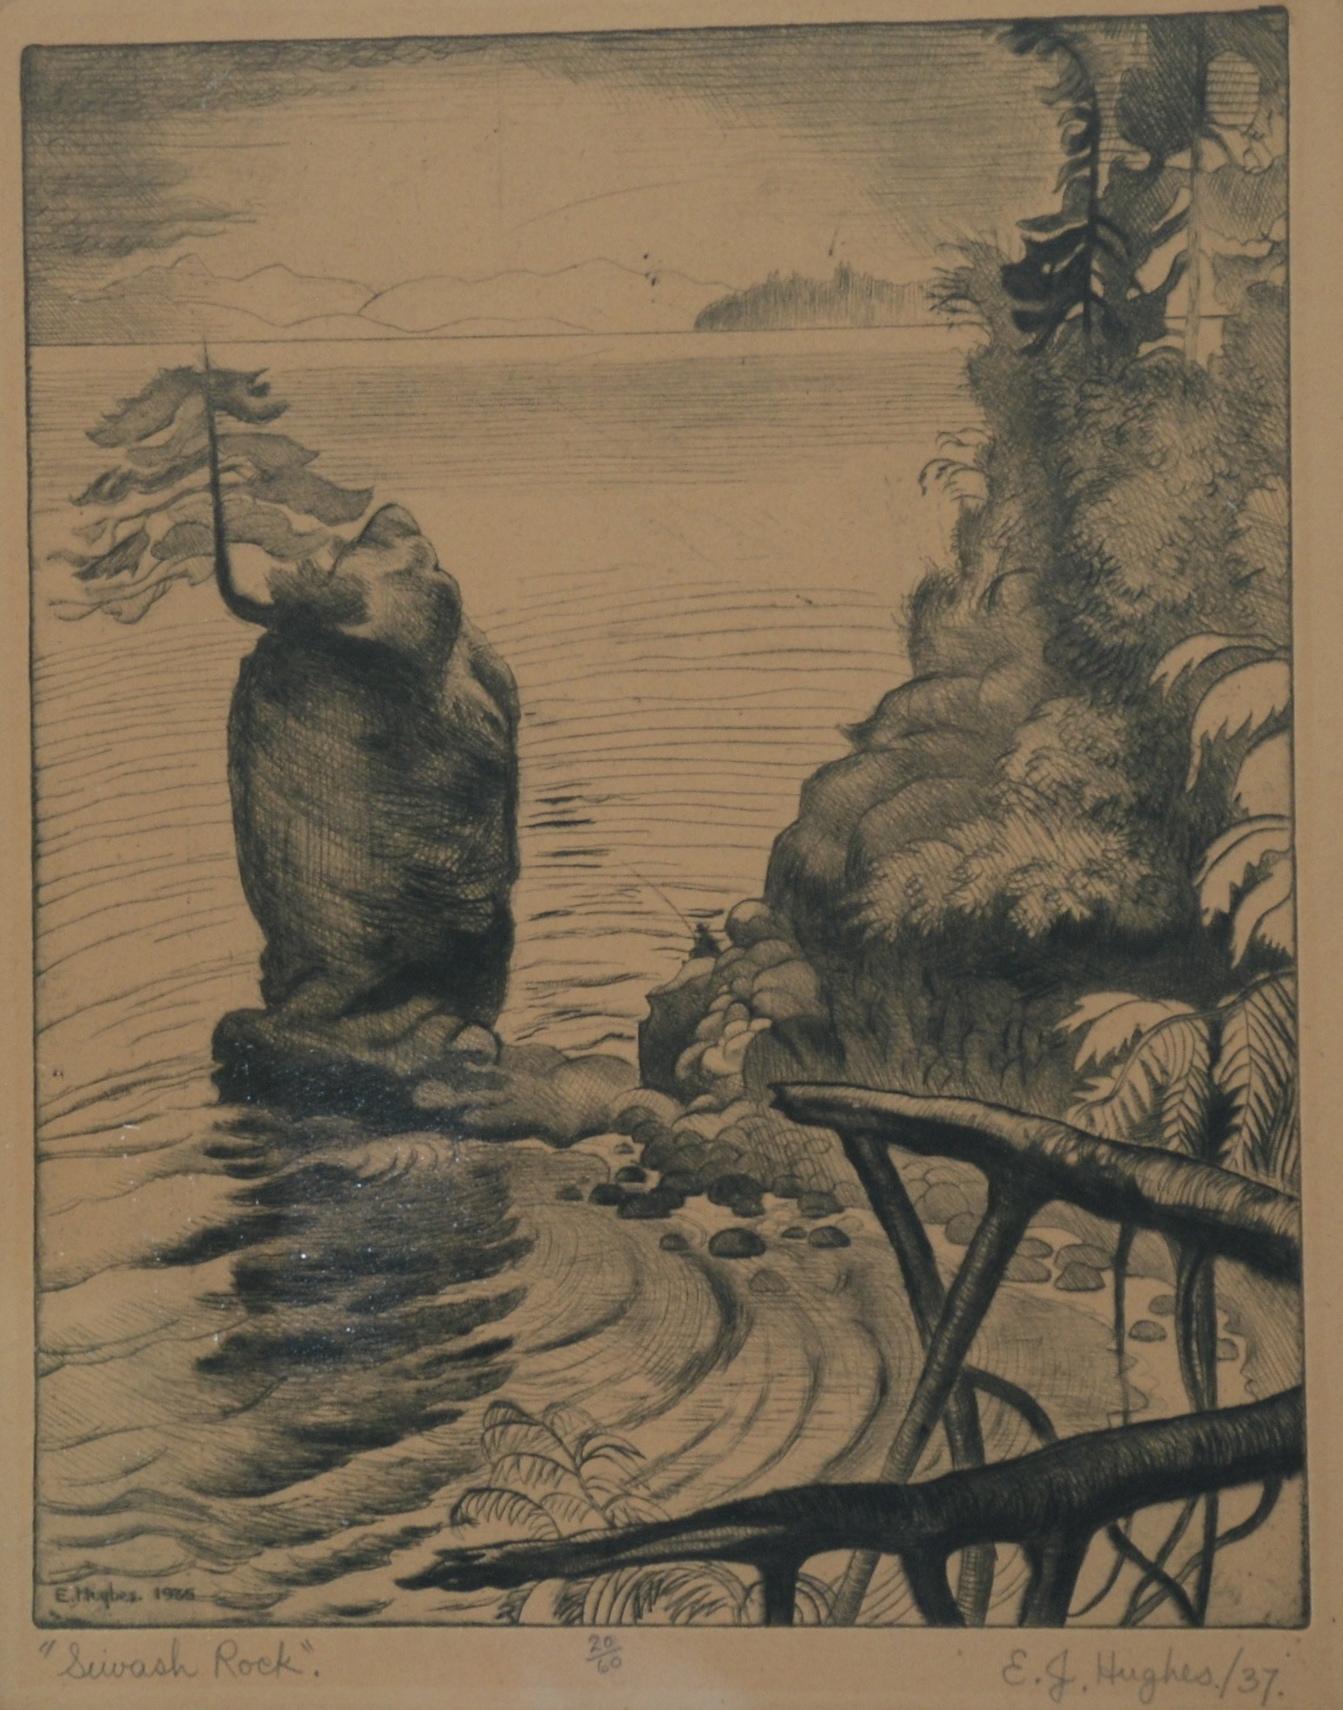 E. J. Hughes, Siwash Rock, 1935